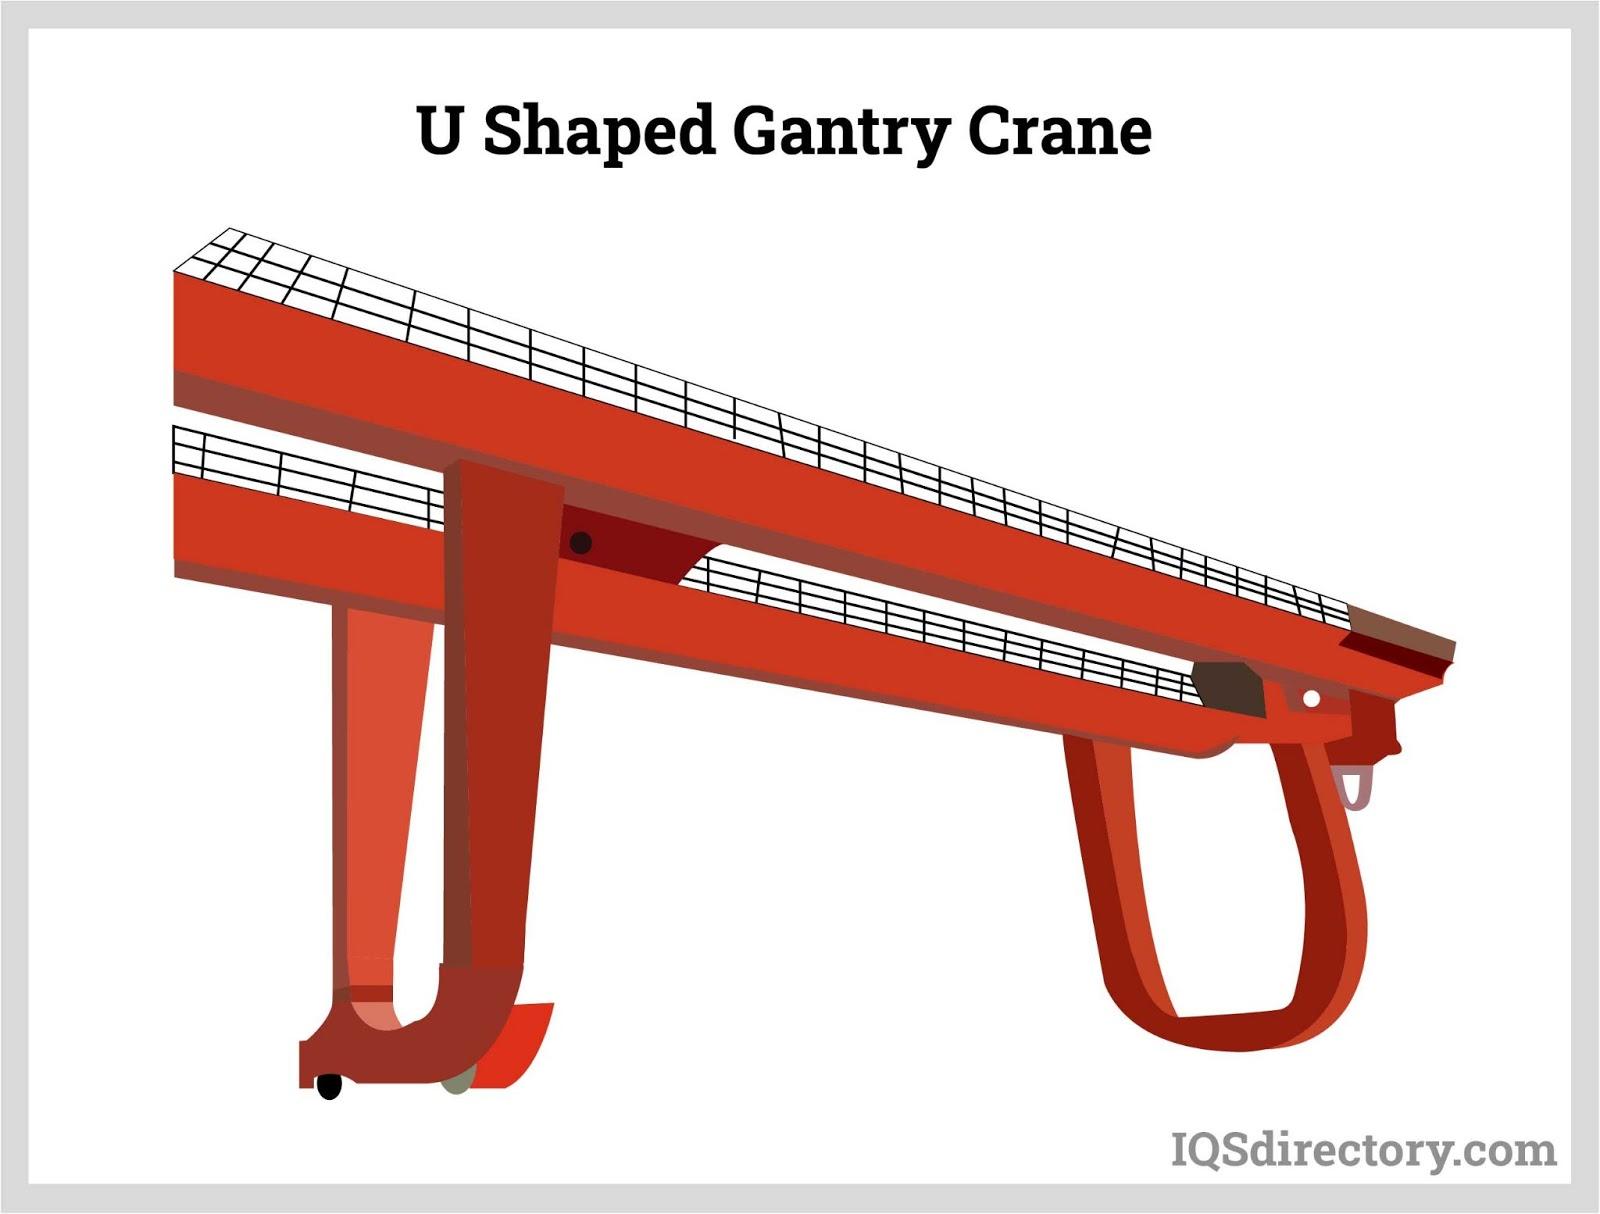 U Shaped Gantry Crane